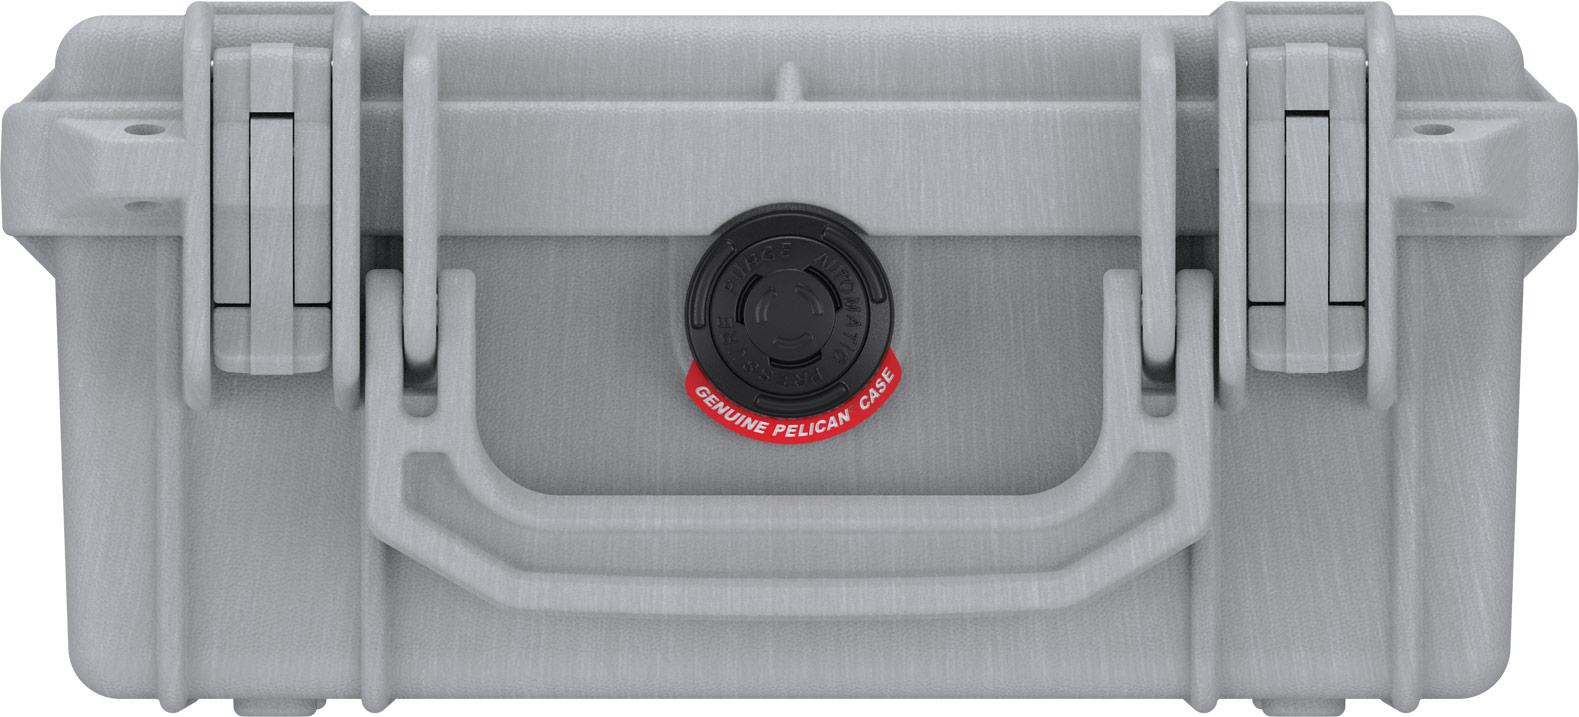 pelican protector 1150 silver watertight hard case